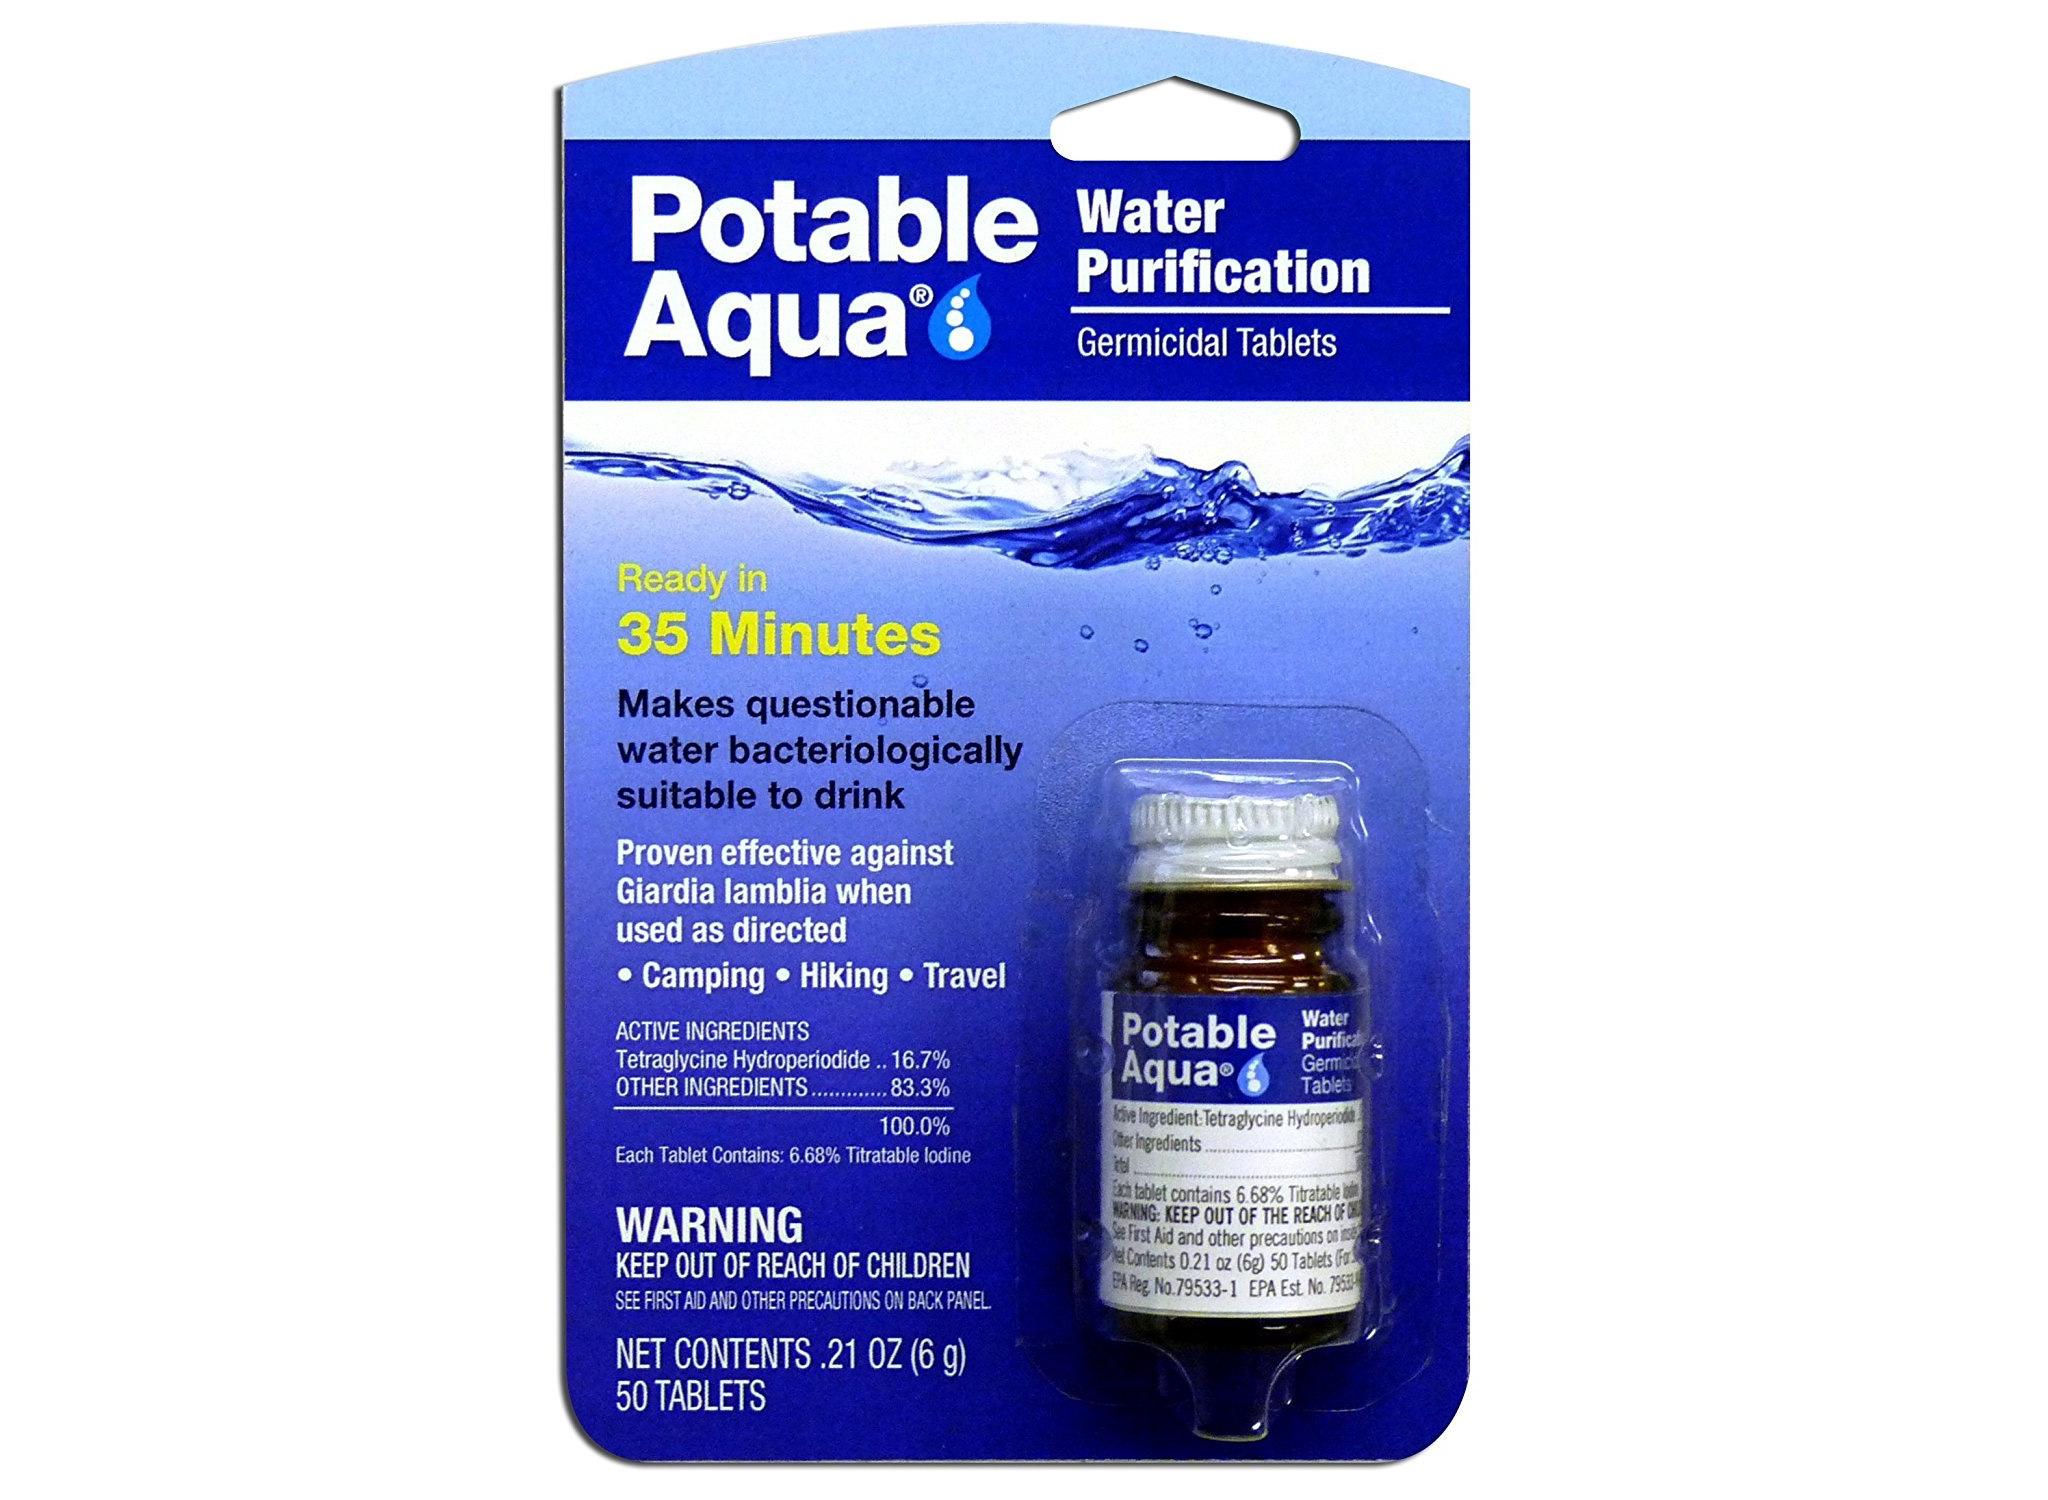 Potable Aqua Water Purification Germicidal Tablets